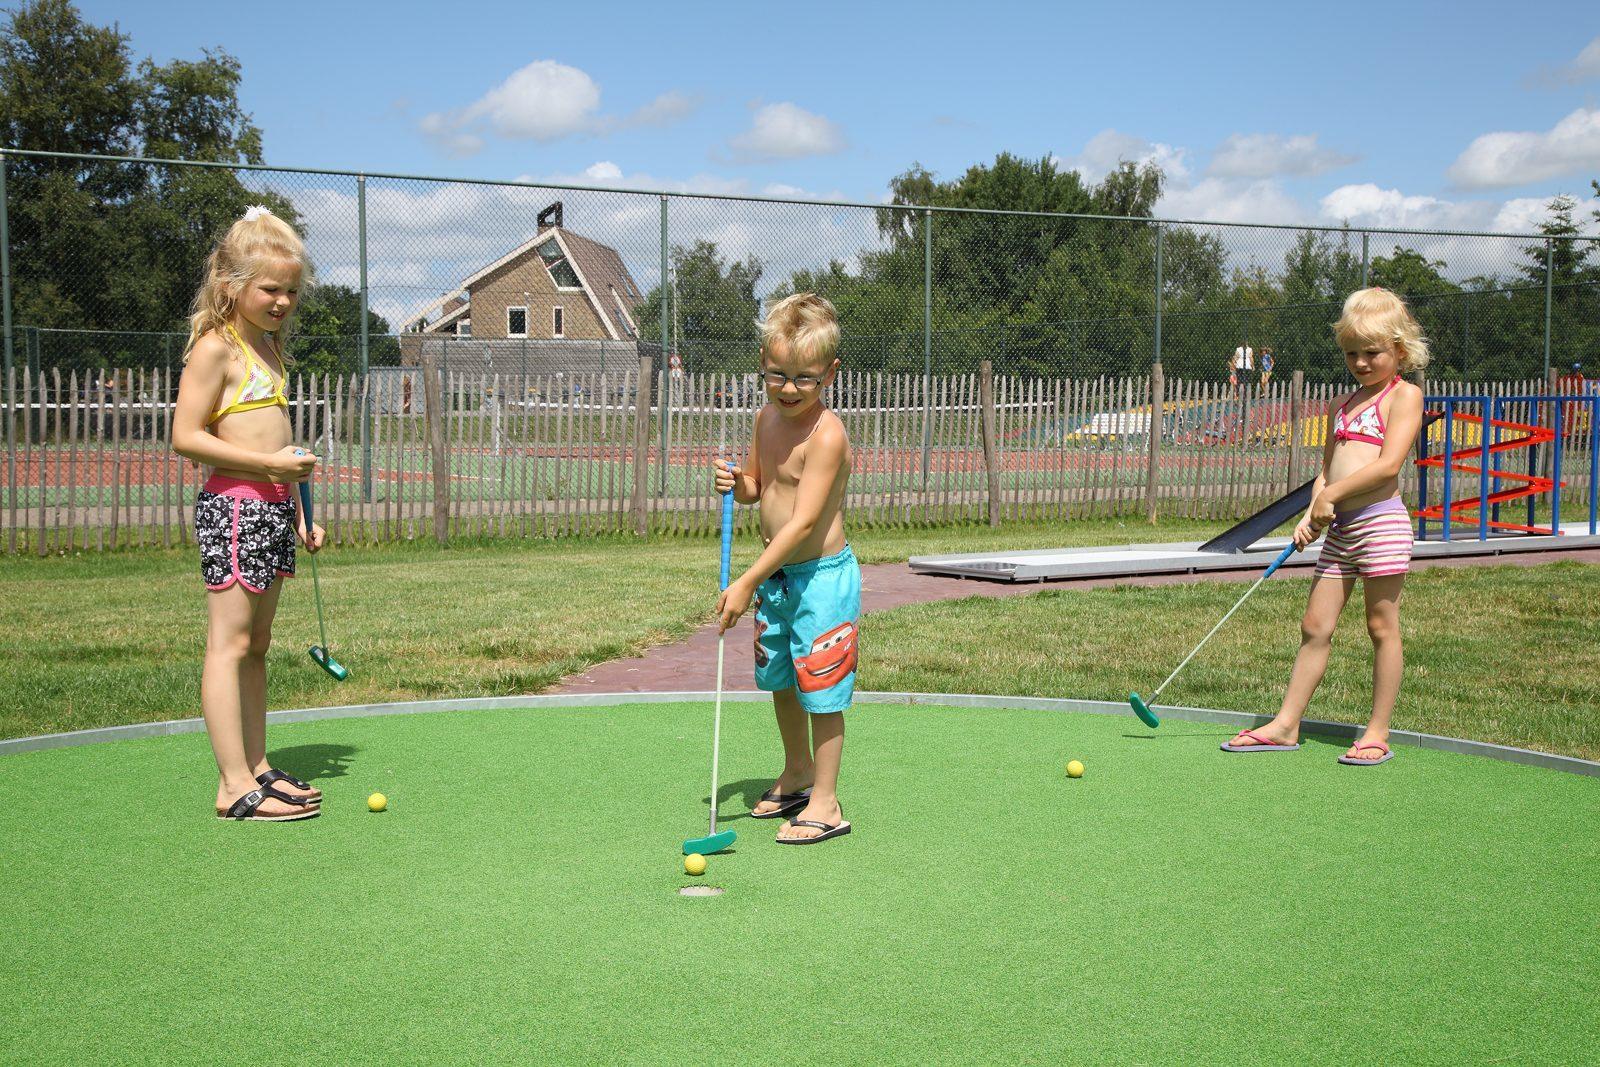 Midget-putt-golf